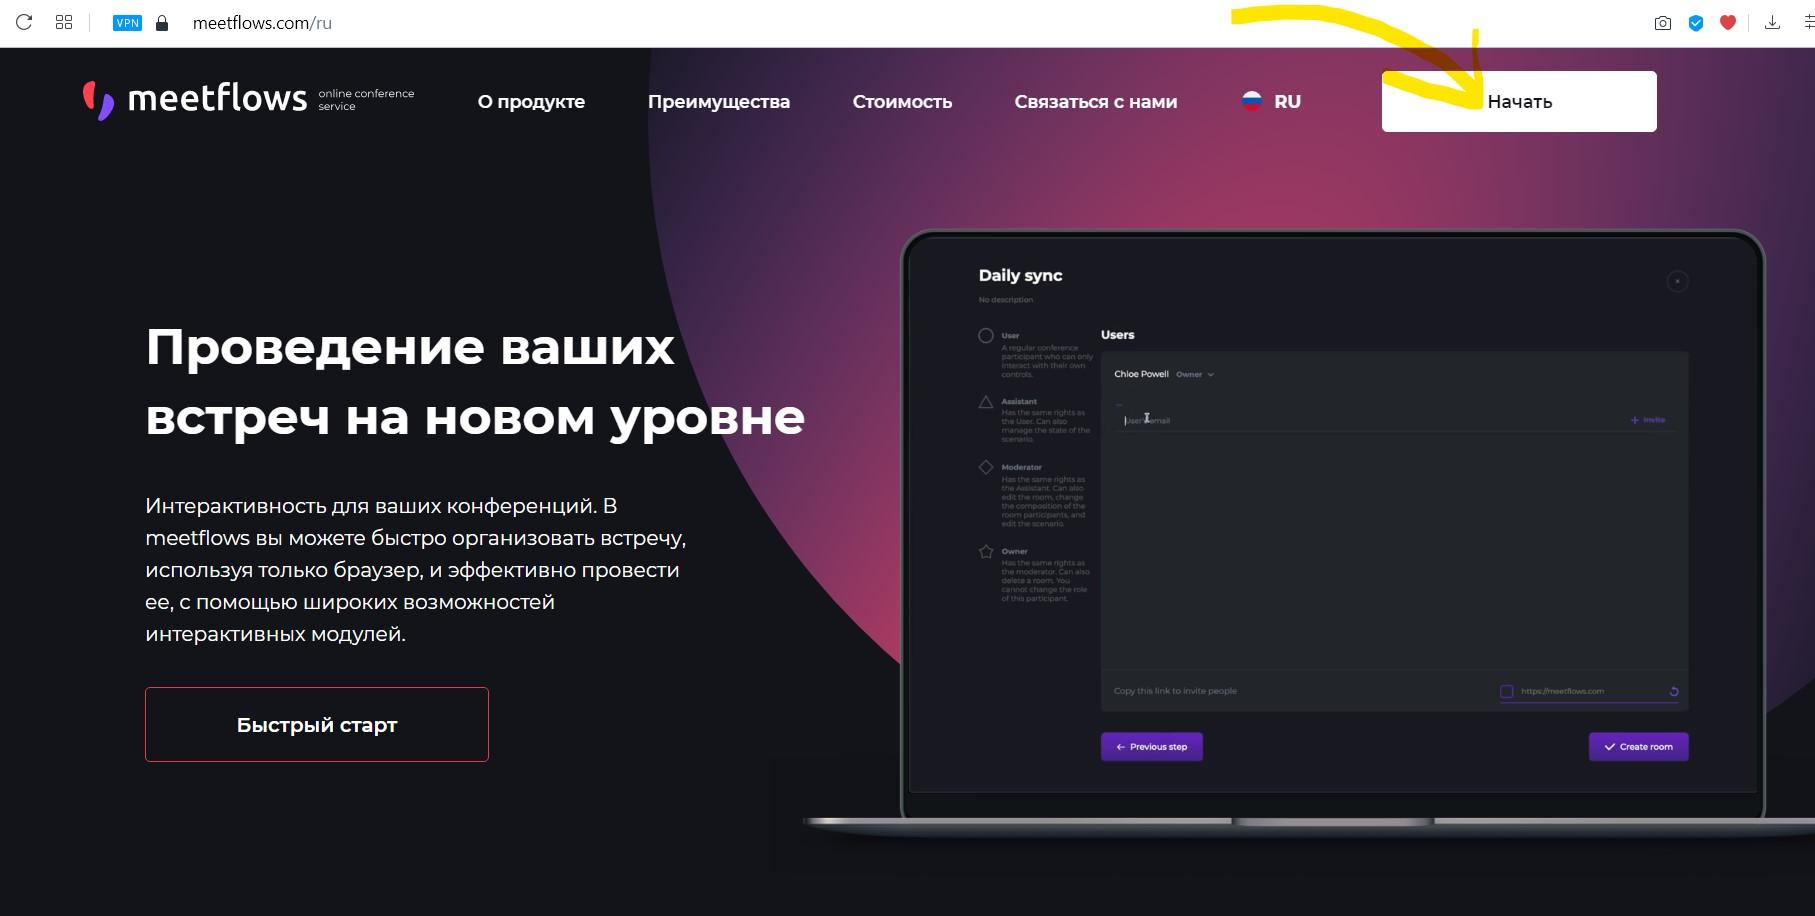 http://r4m.ru/wp-content/uploads/2021/01/snimok-ekrana-2021-01-09-032852.jpg